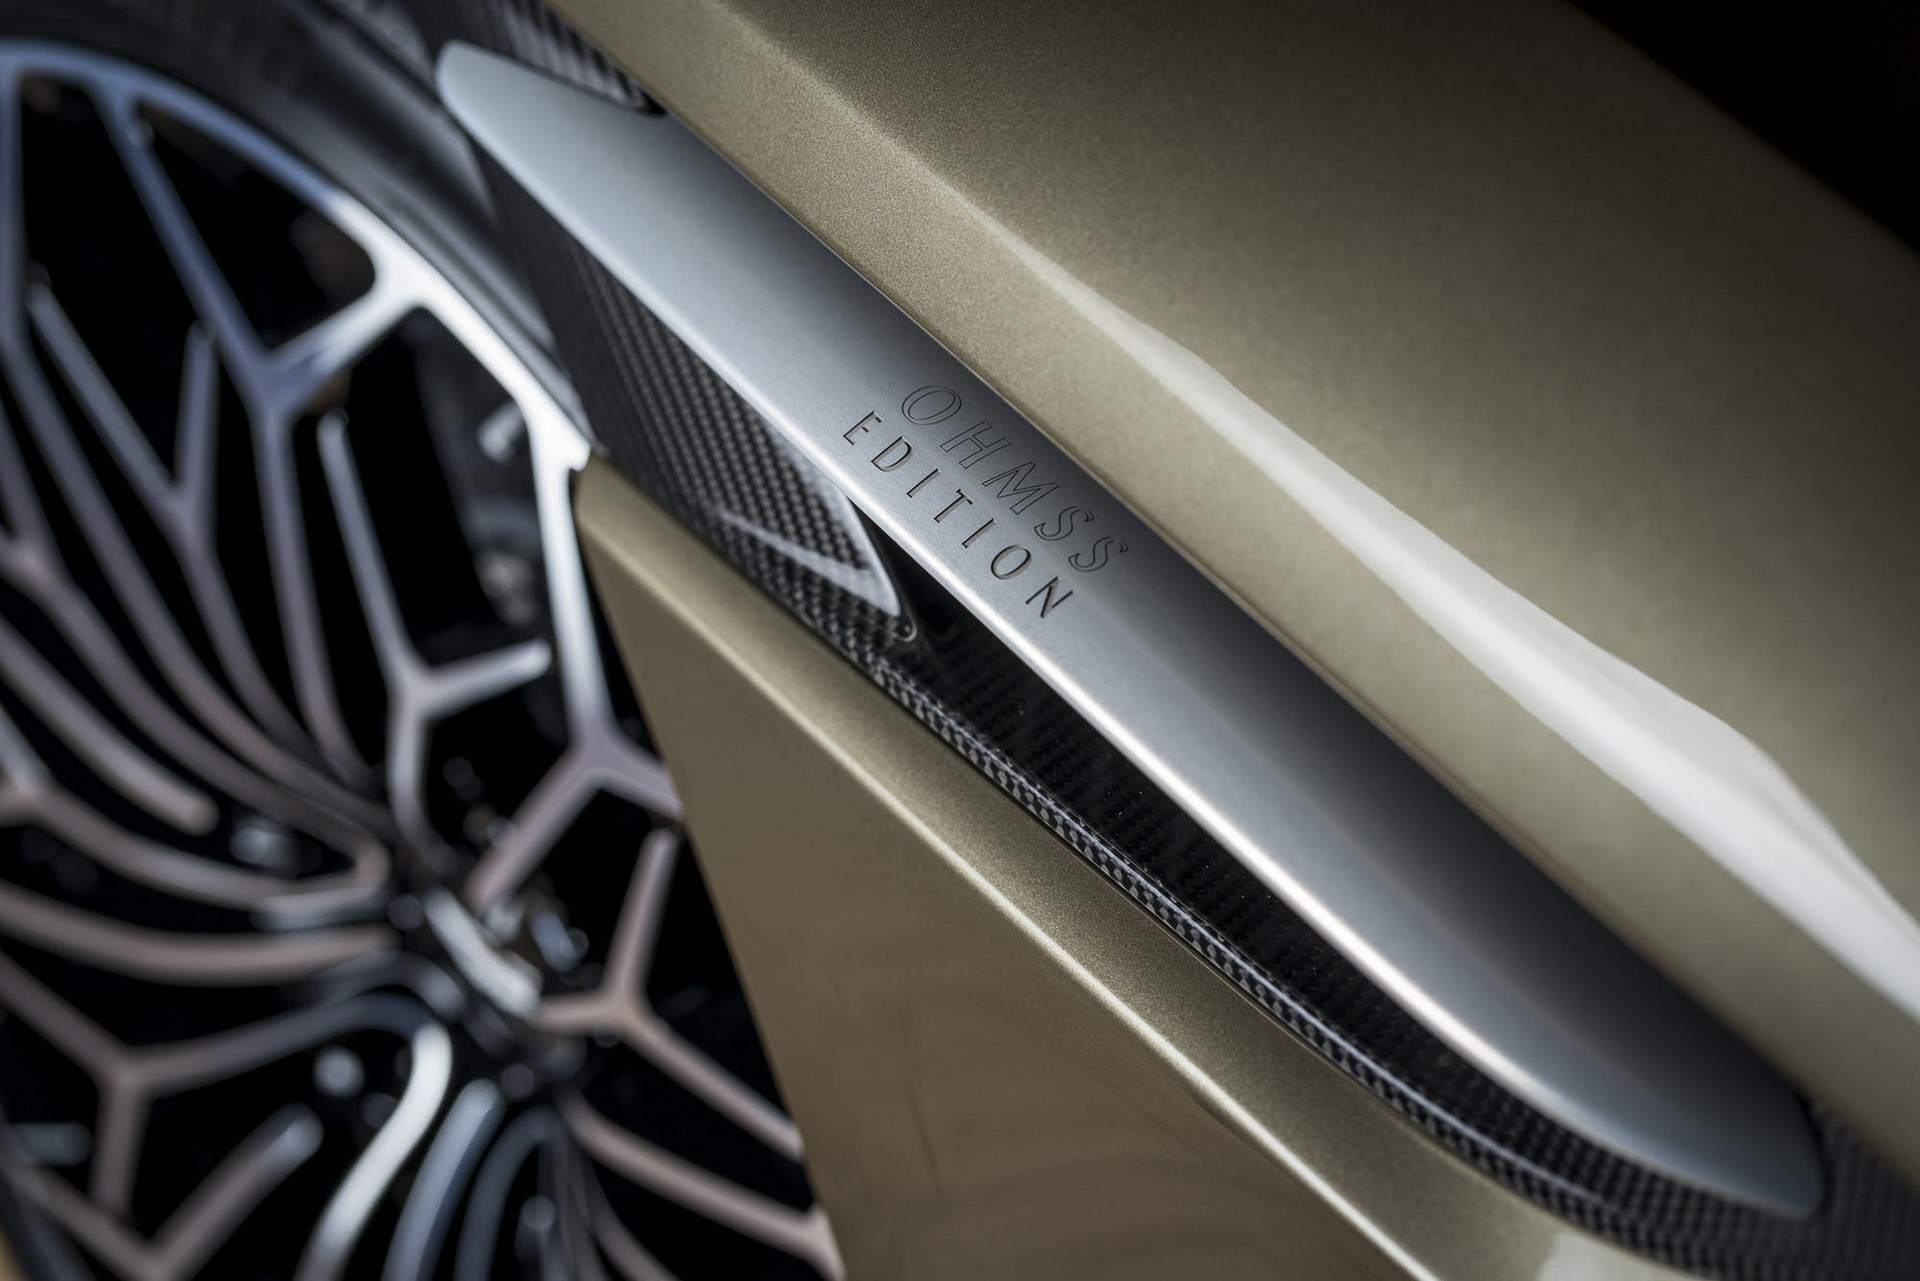 Aston-Martin-DBS-Superleggera-James-Bond-Special-Edition-11